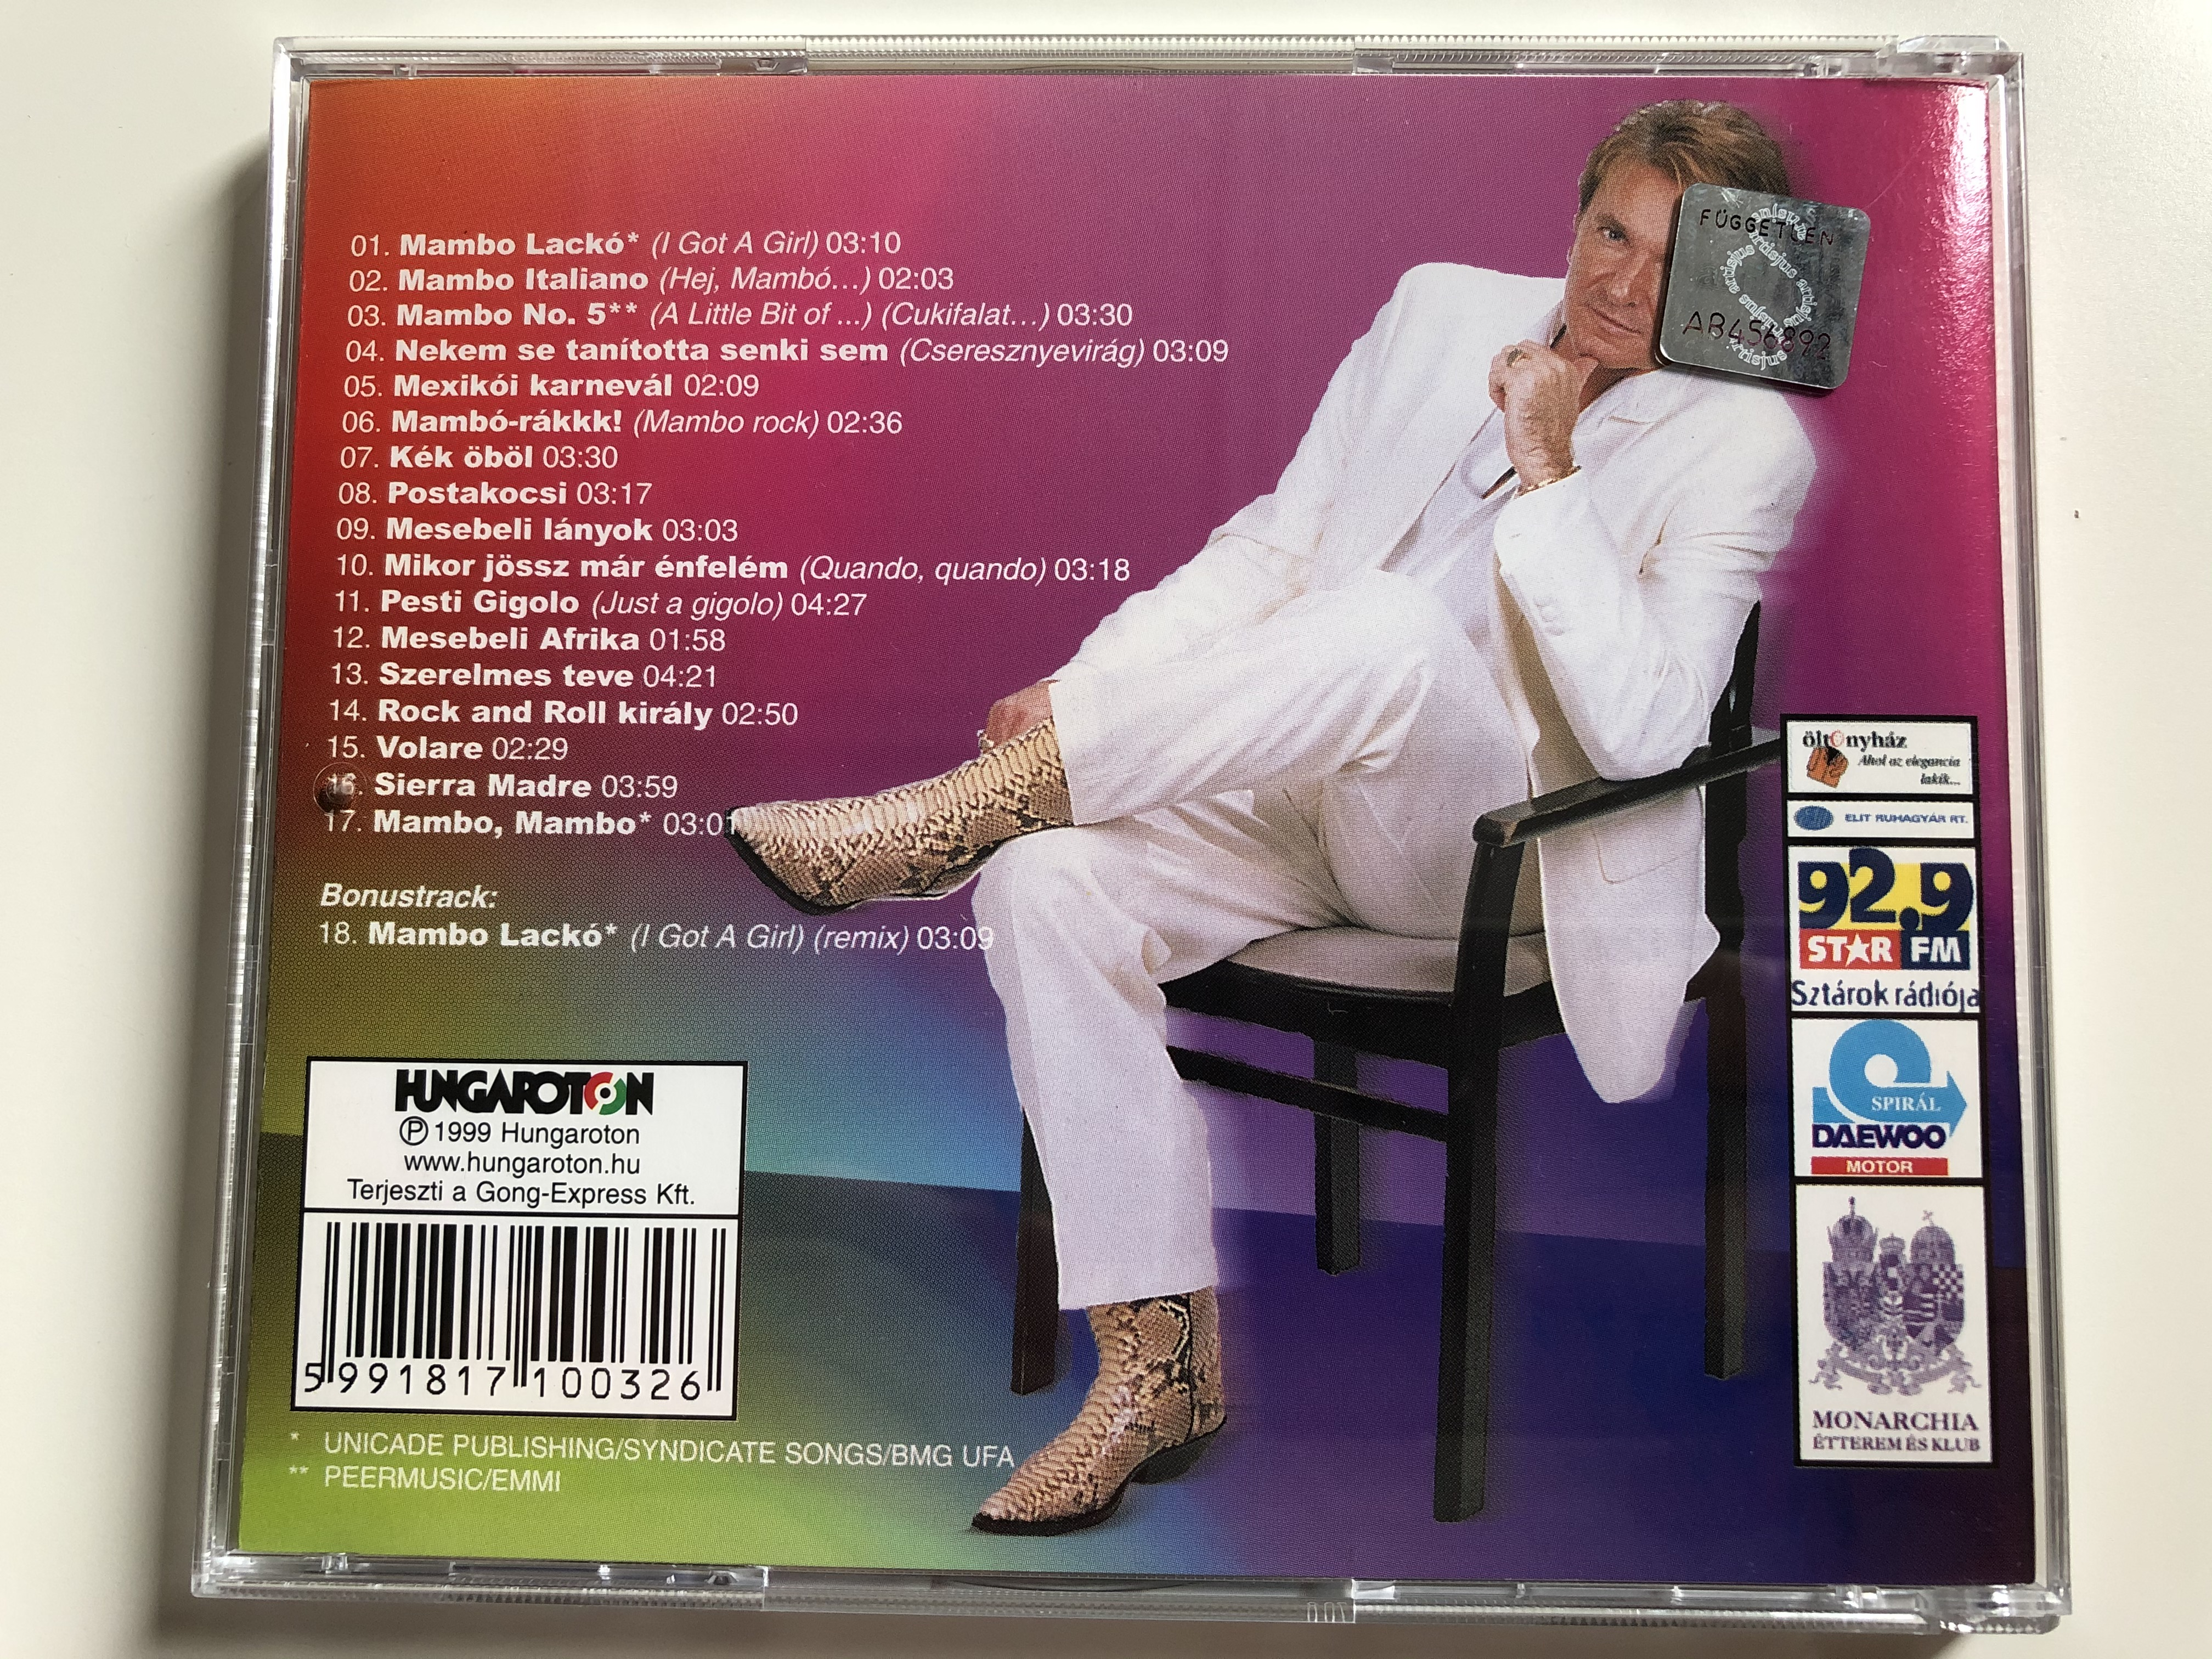 kom-r-l-szl-mambo-lack-hungaroton-audio-cd-1999-hcd-71003-5-.jpg